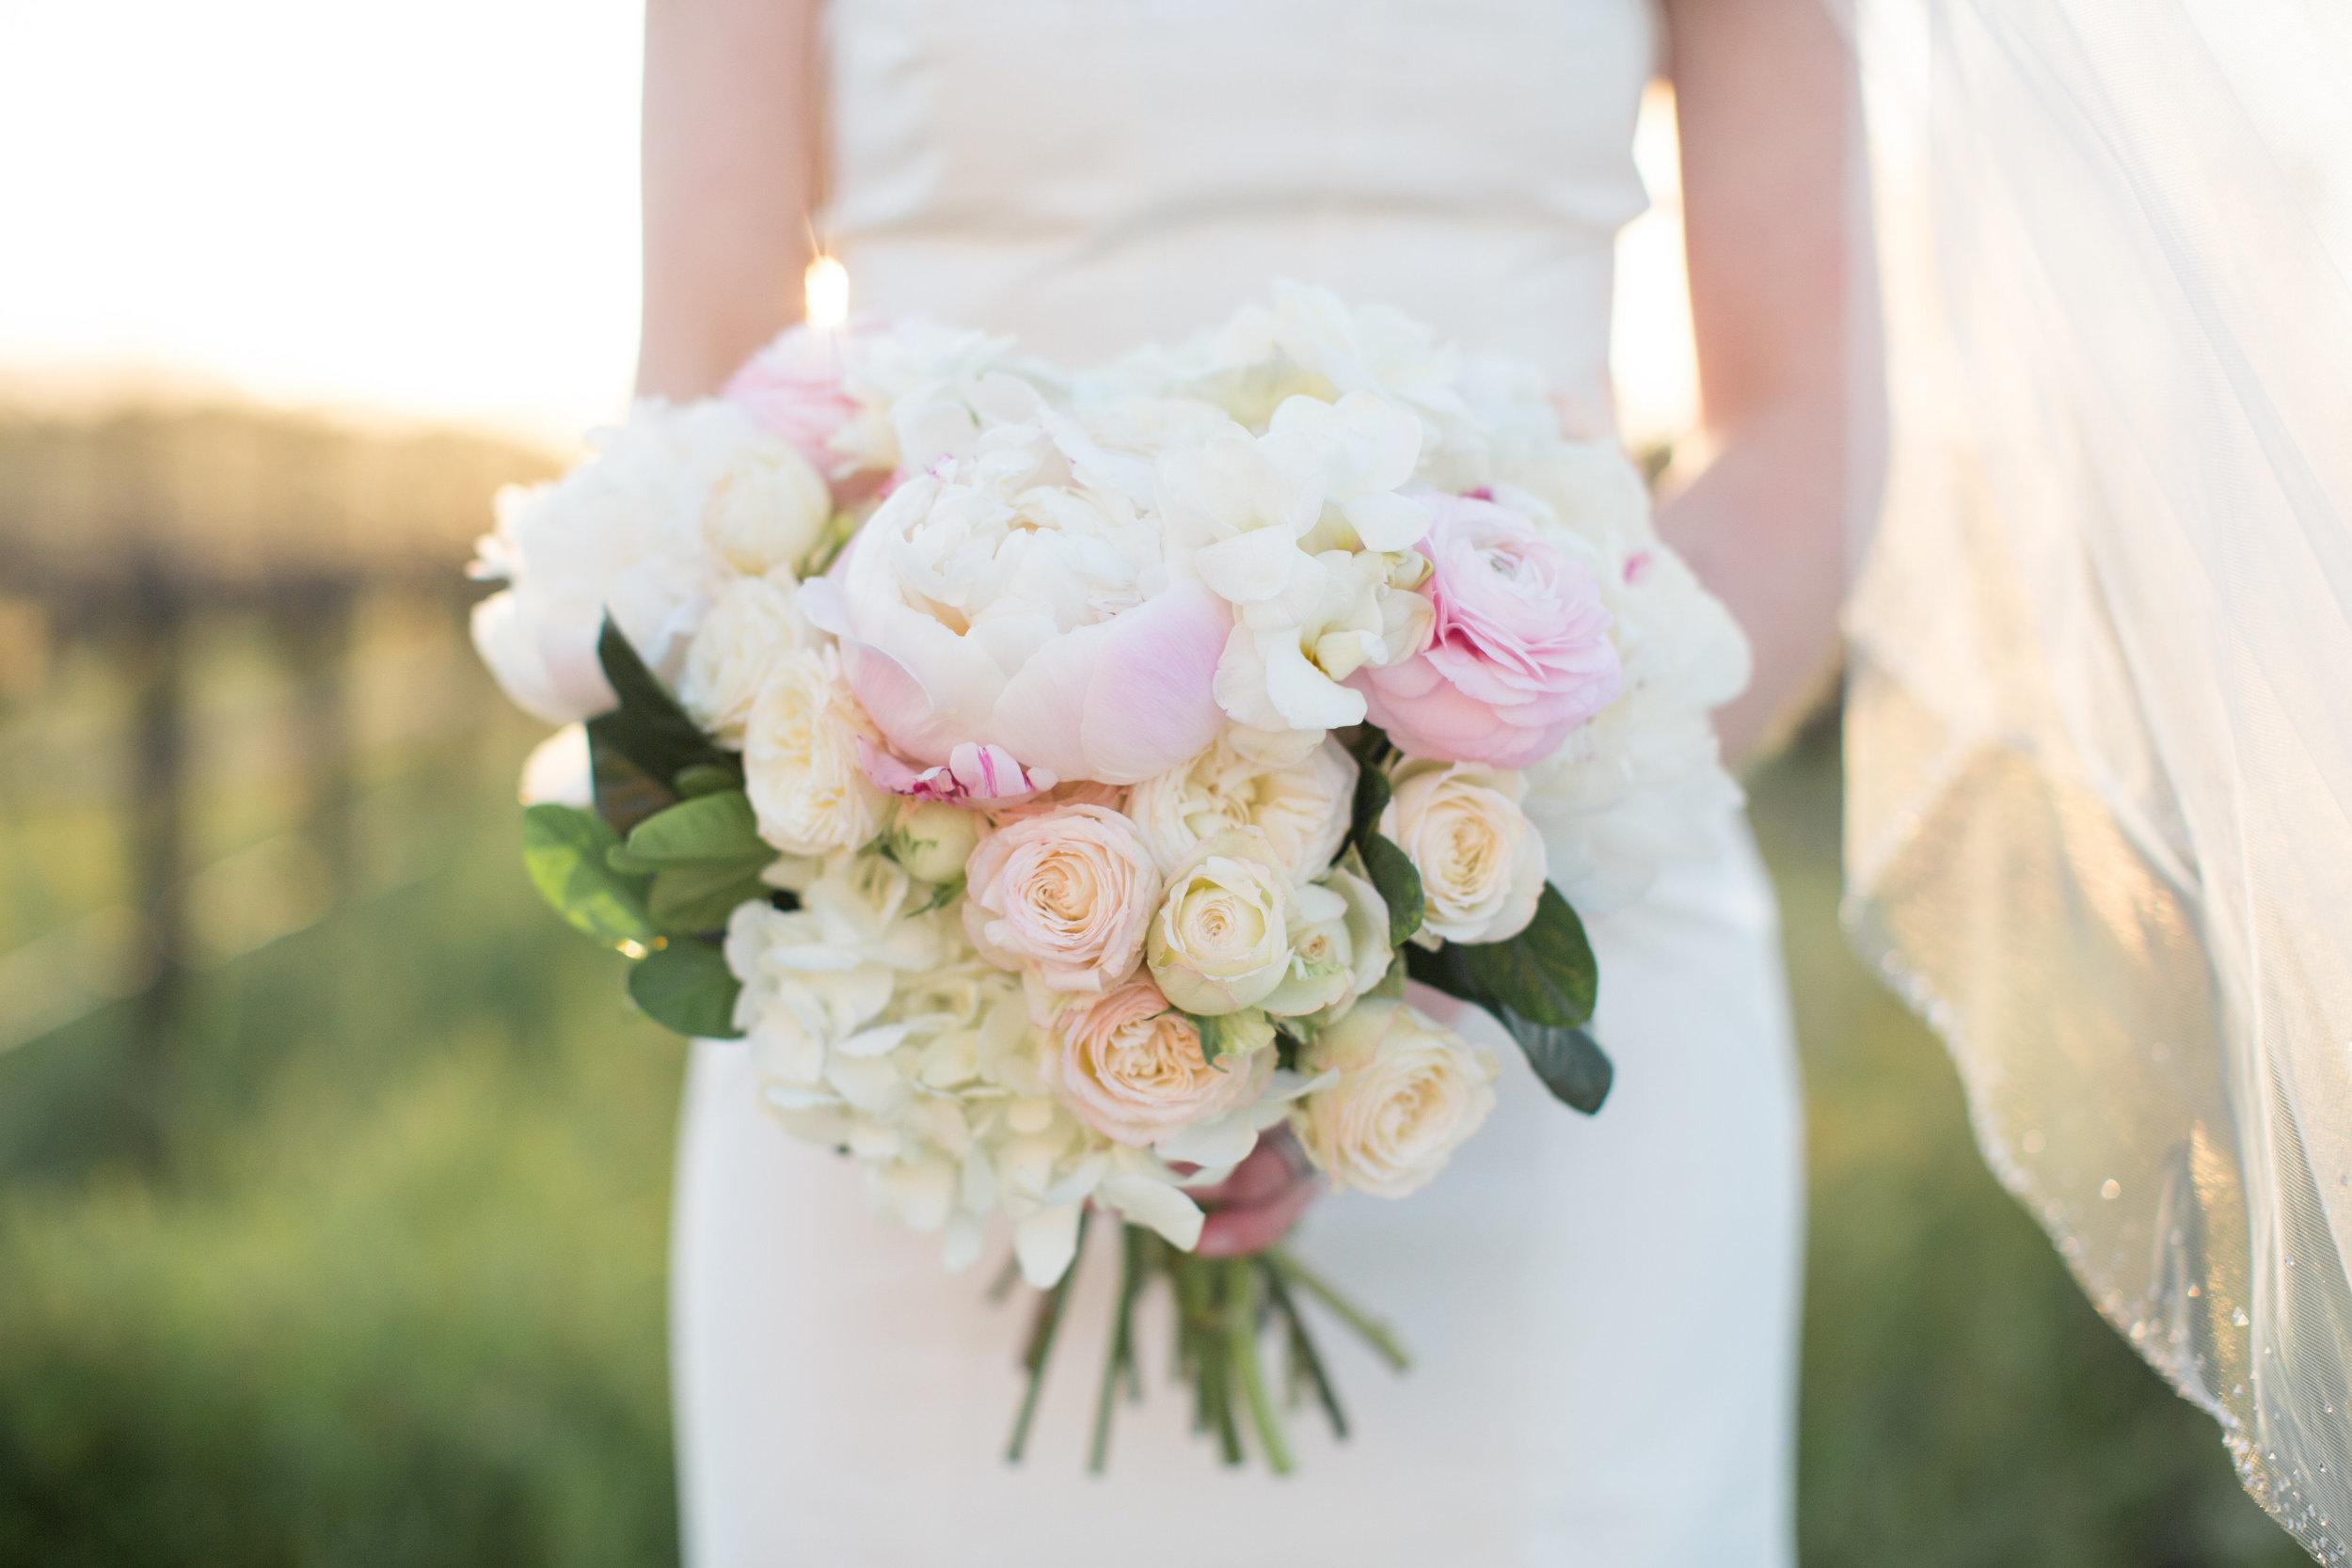 santa-barbara-elopement-wedding-planner-planning-coordinator-event-day-of-sunstone-winery-villa-tuscan-vineyard-gold-classic-elope (8).jpg